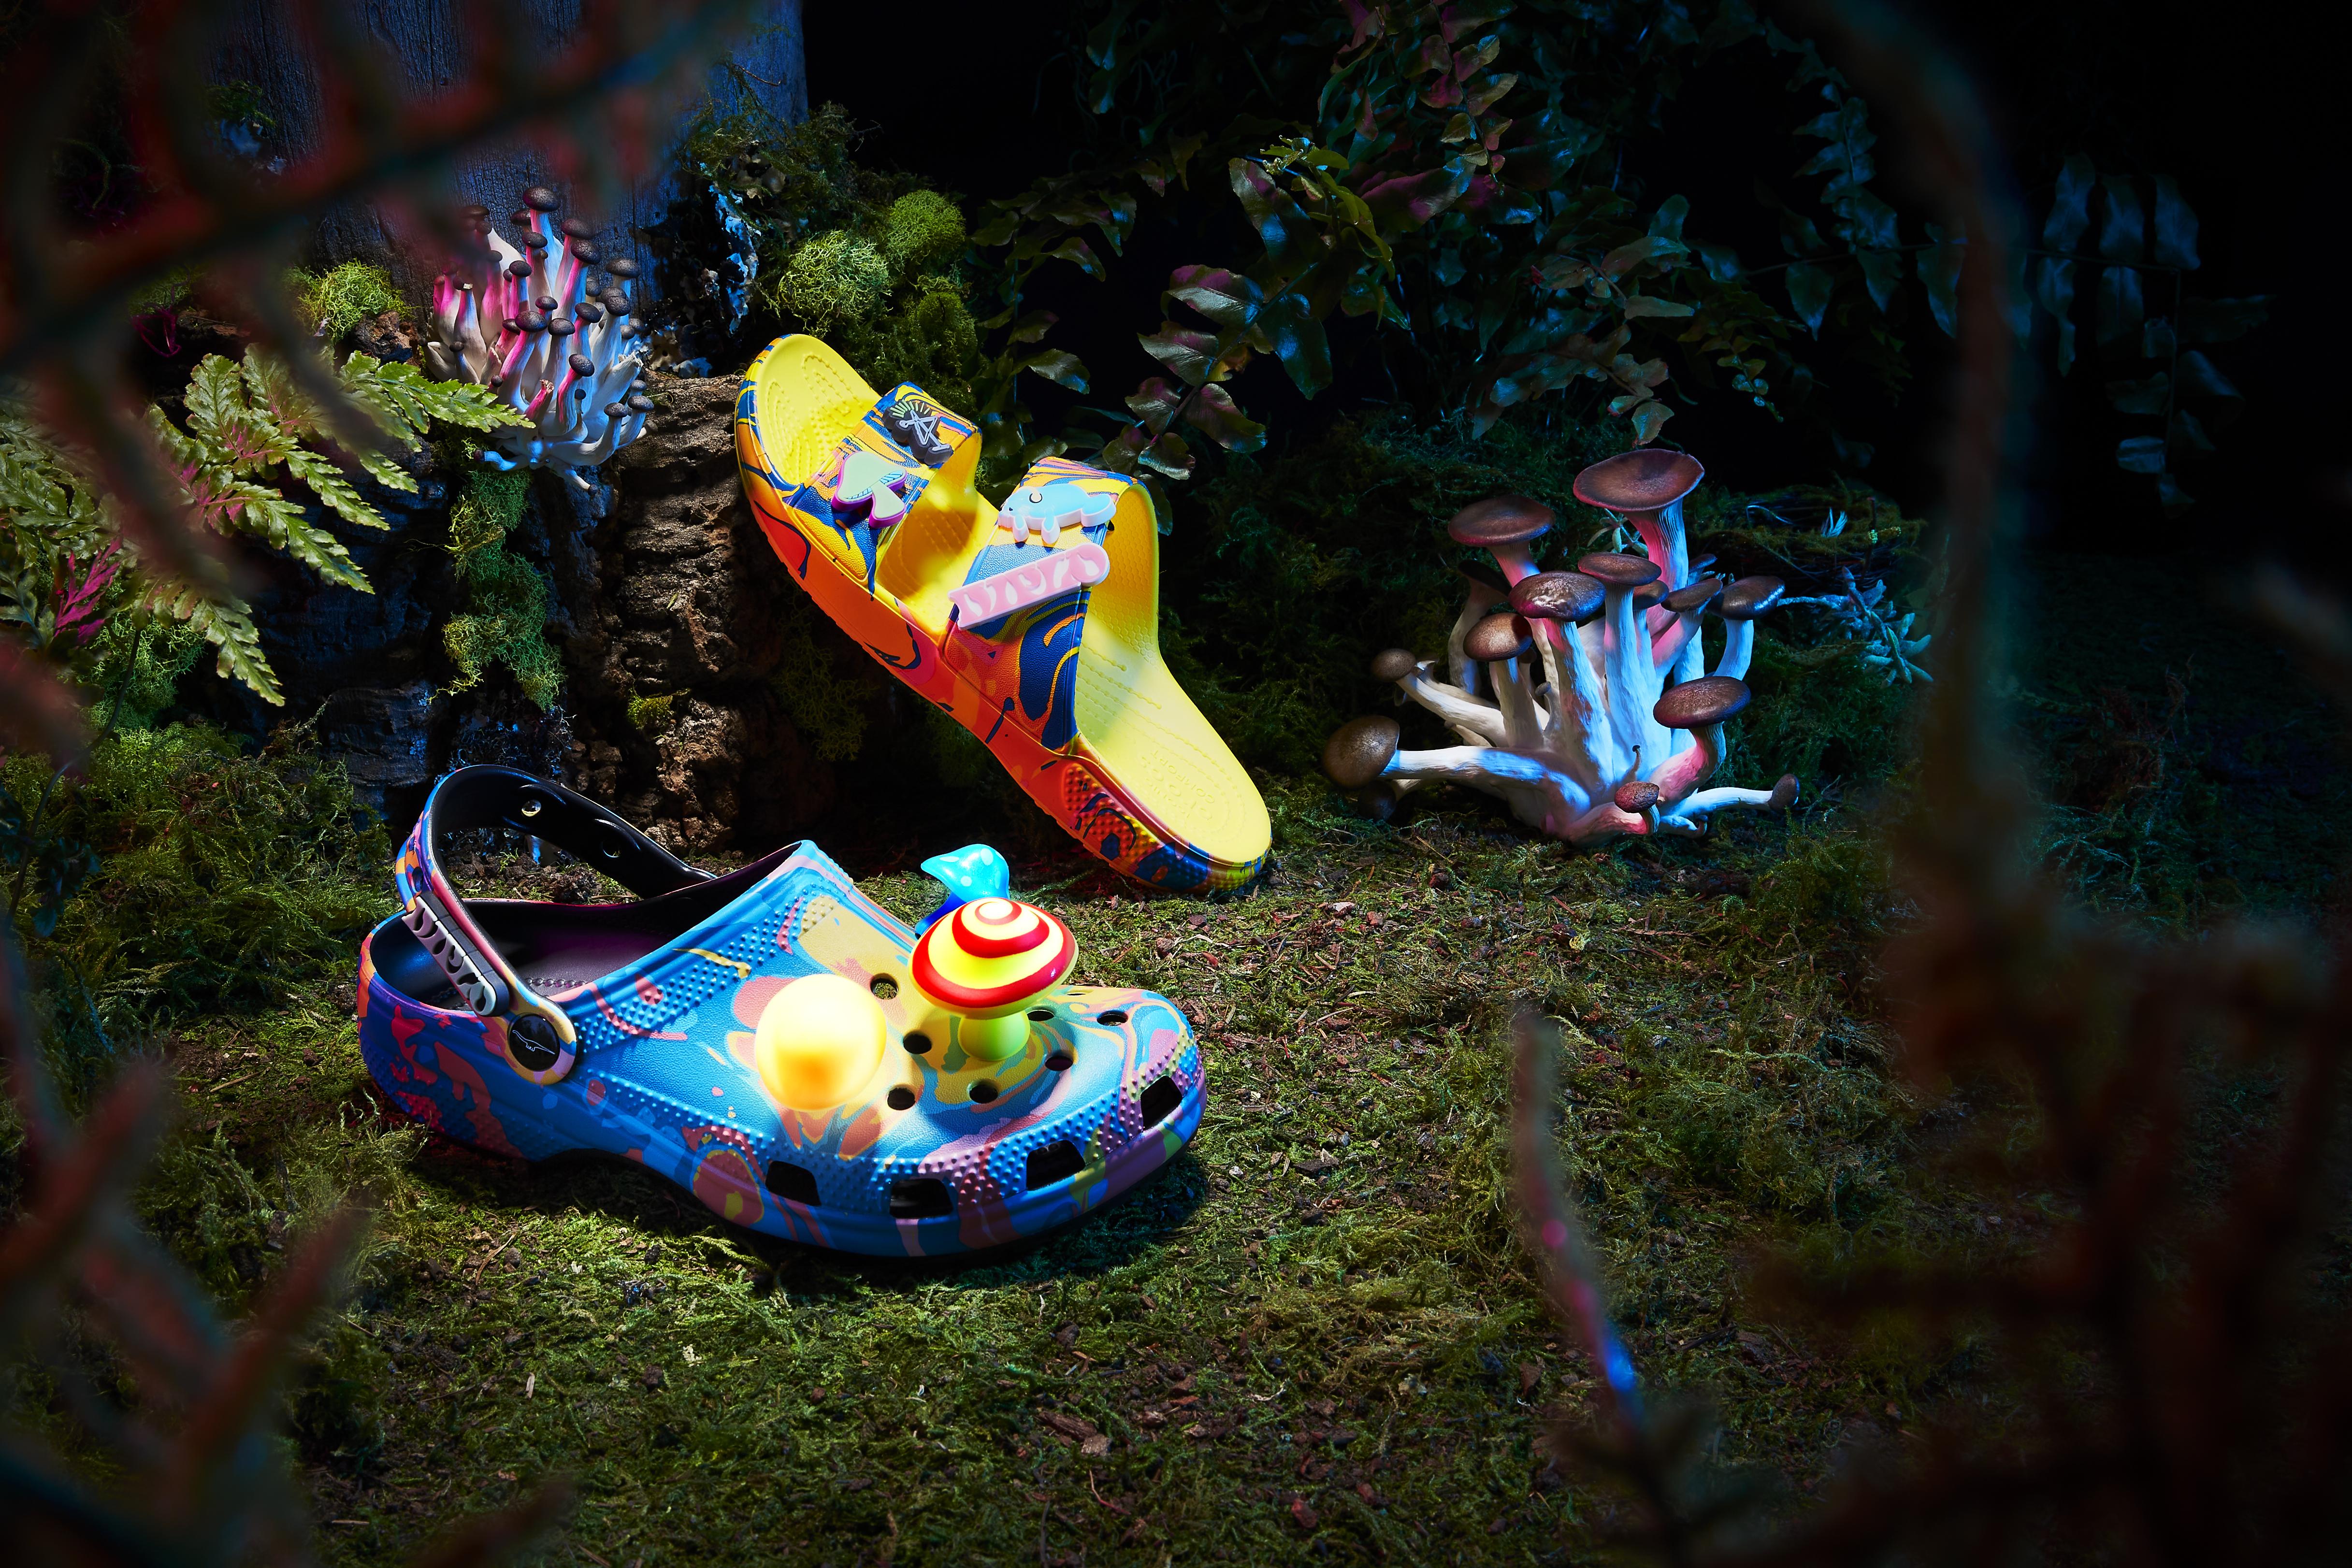 Diplo x Crocs Collaboration: Where to Buy, Photos